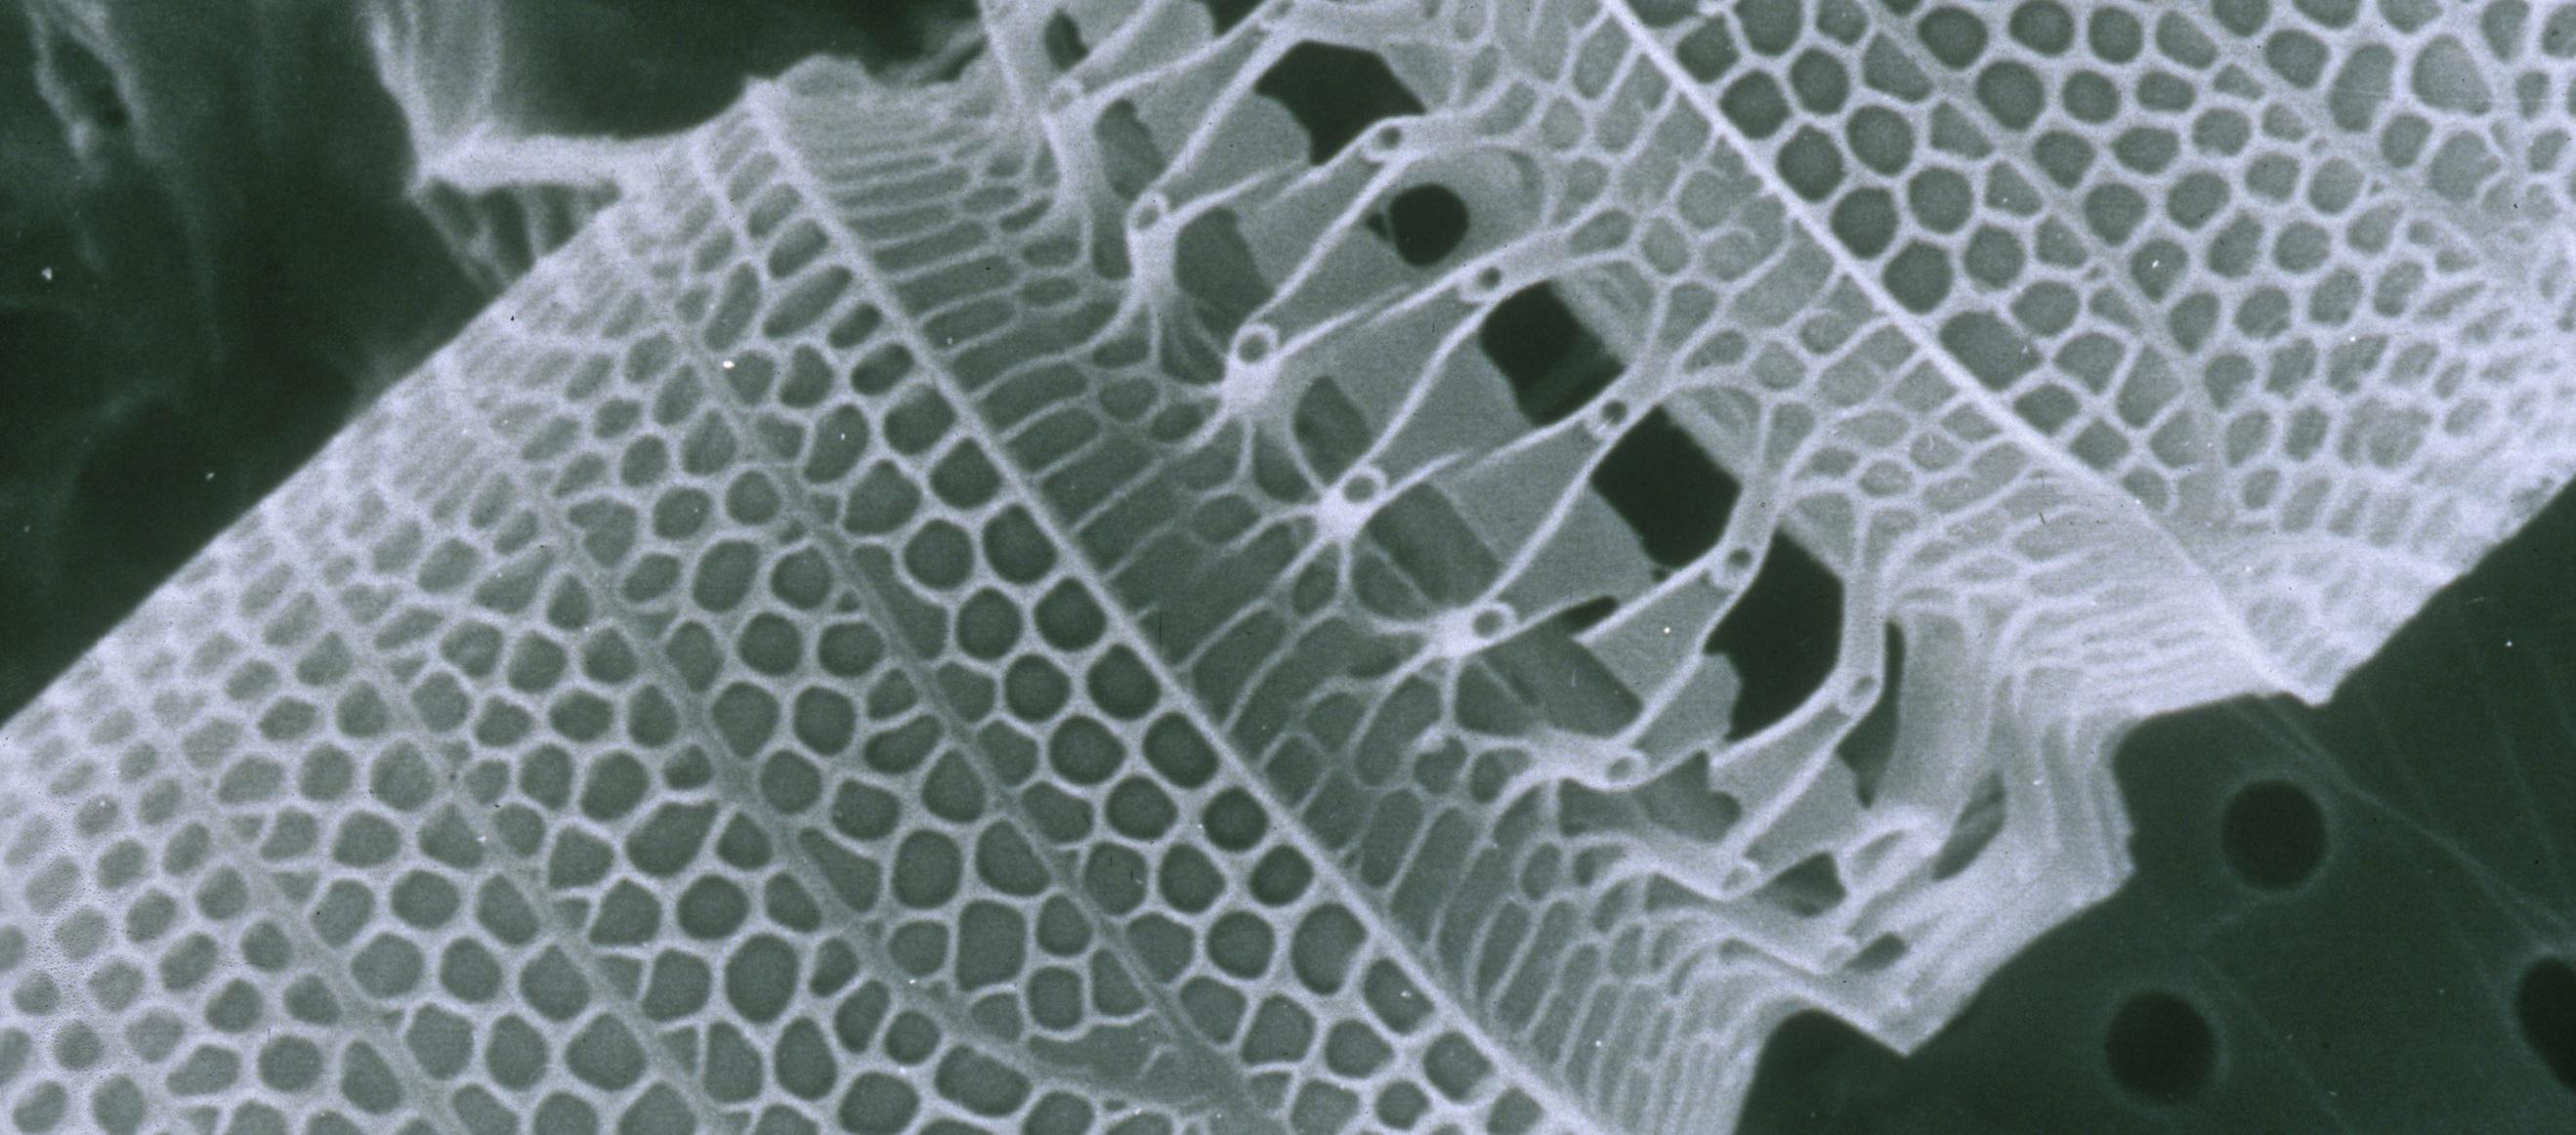 An close-up of a nanotube. Photo courtesy of CSIRO Science Image.